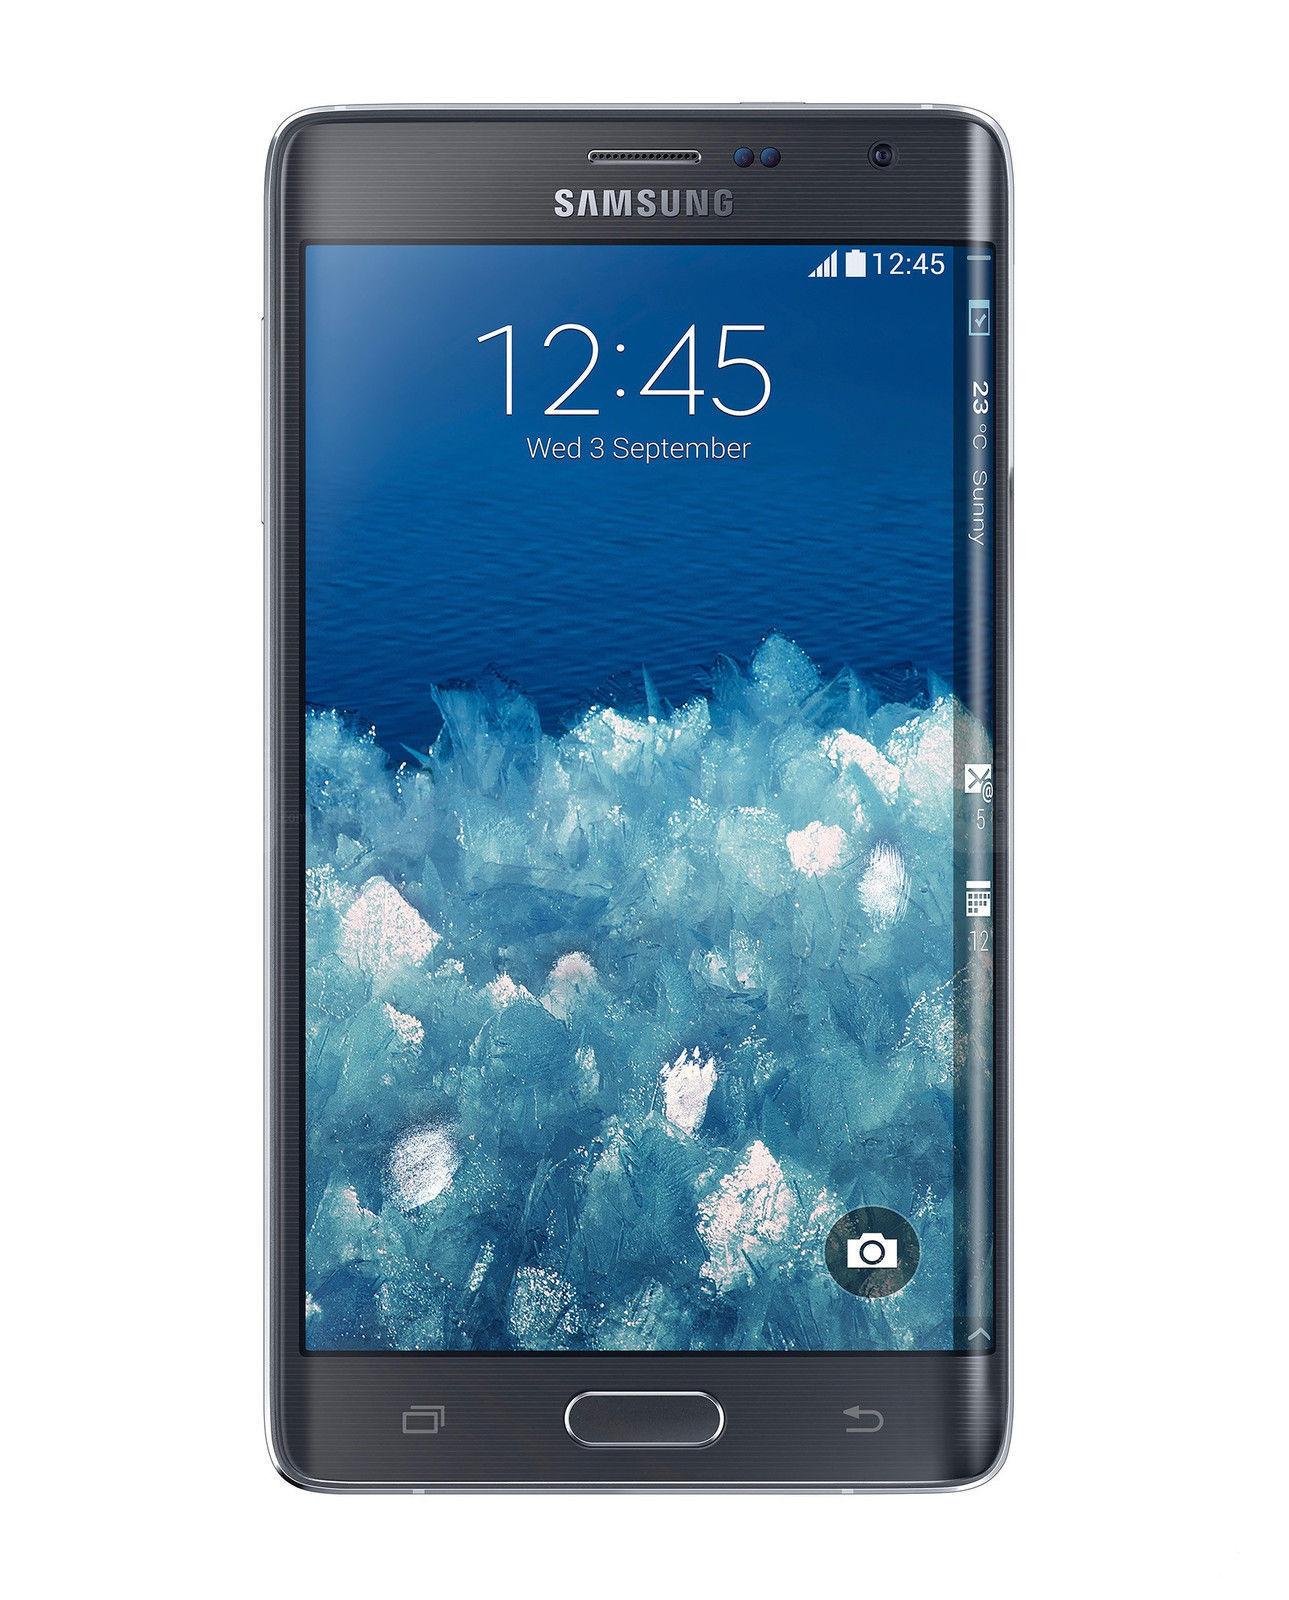 Samsung Galaxy Note Edge SM-N915T - 32GB - Charcoal Black (T-Mobile) Smartphone